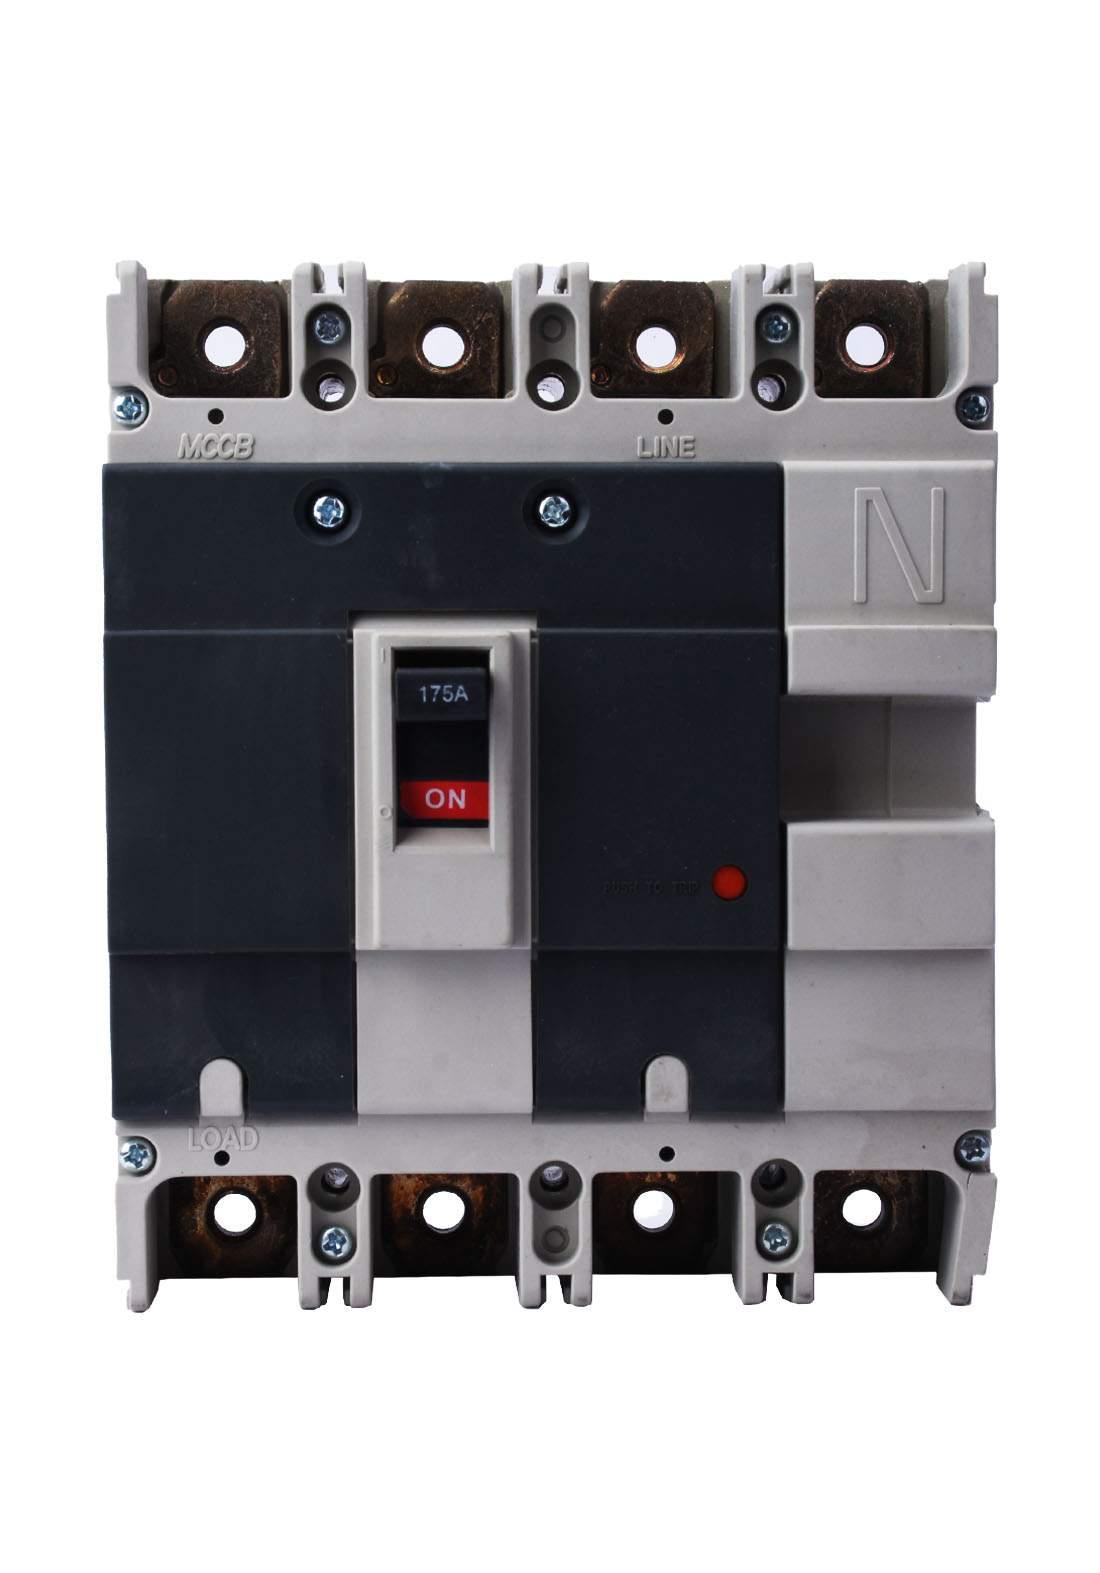 Onesto KMCE204 Circuit Breaker 175 A قاطع تيار الكهرباء هوائي (جوزة)